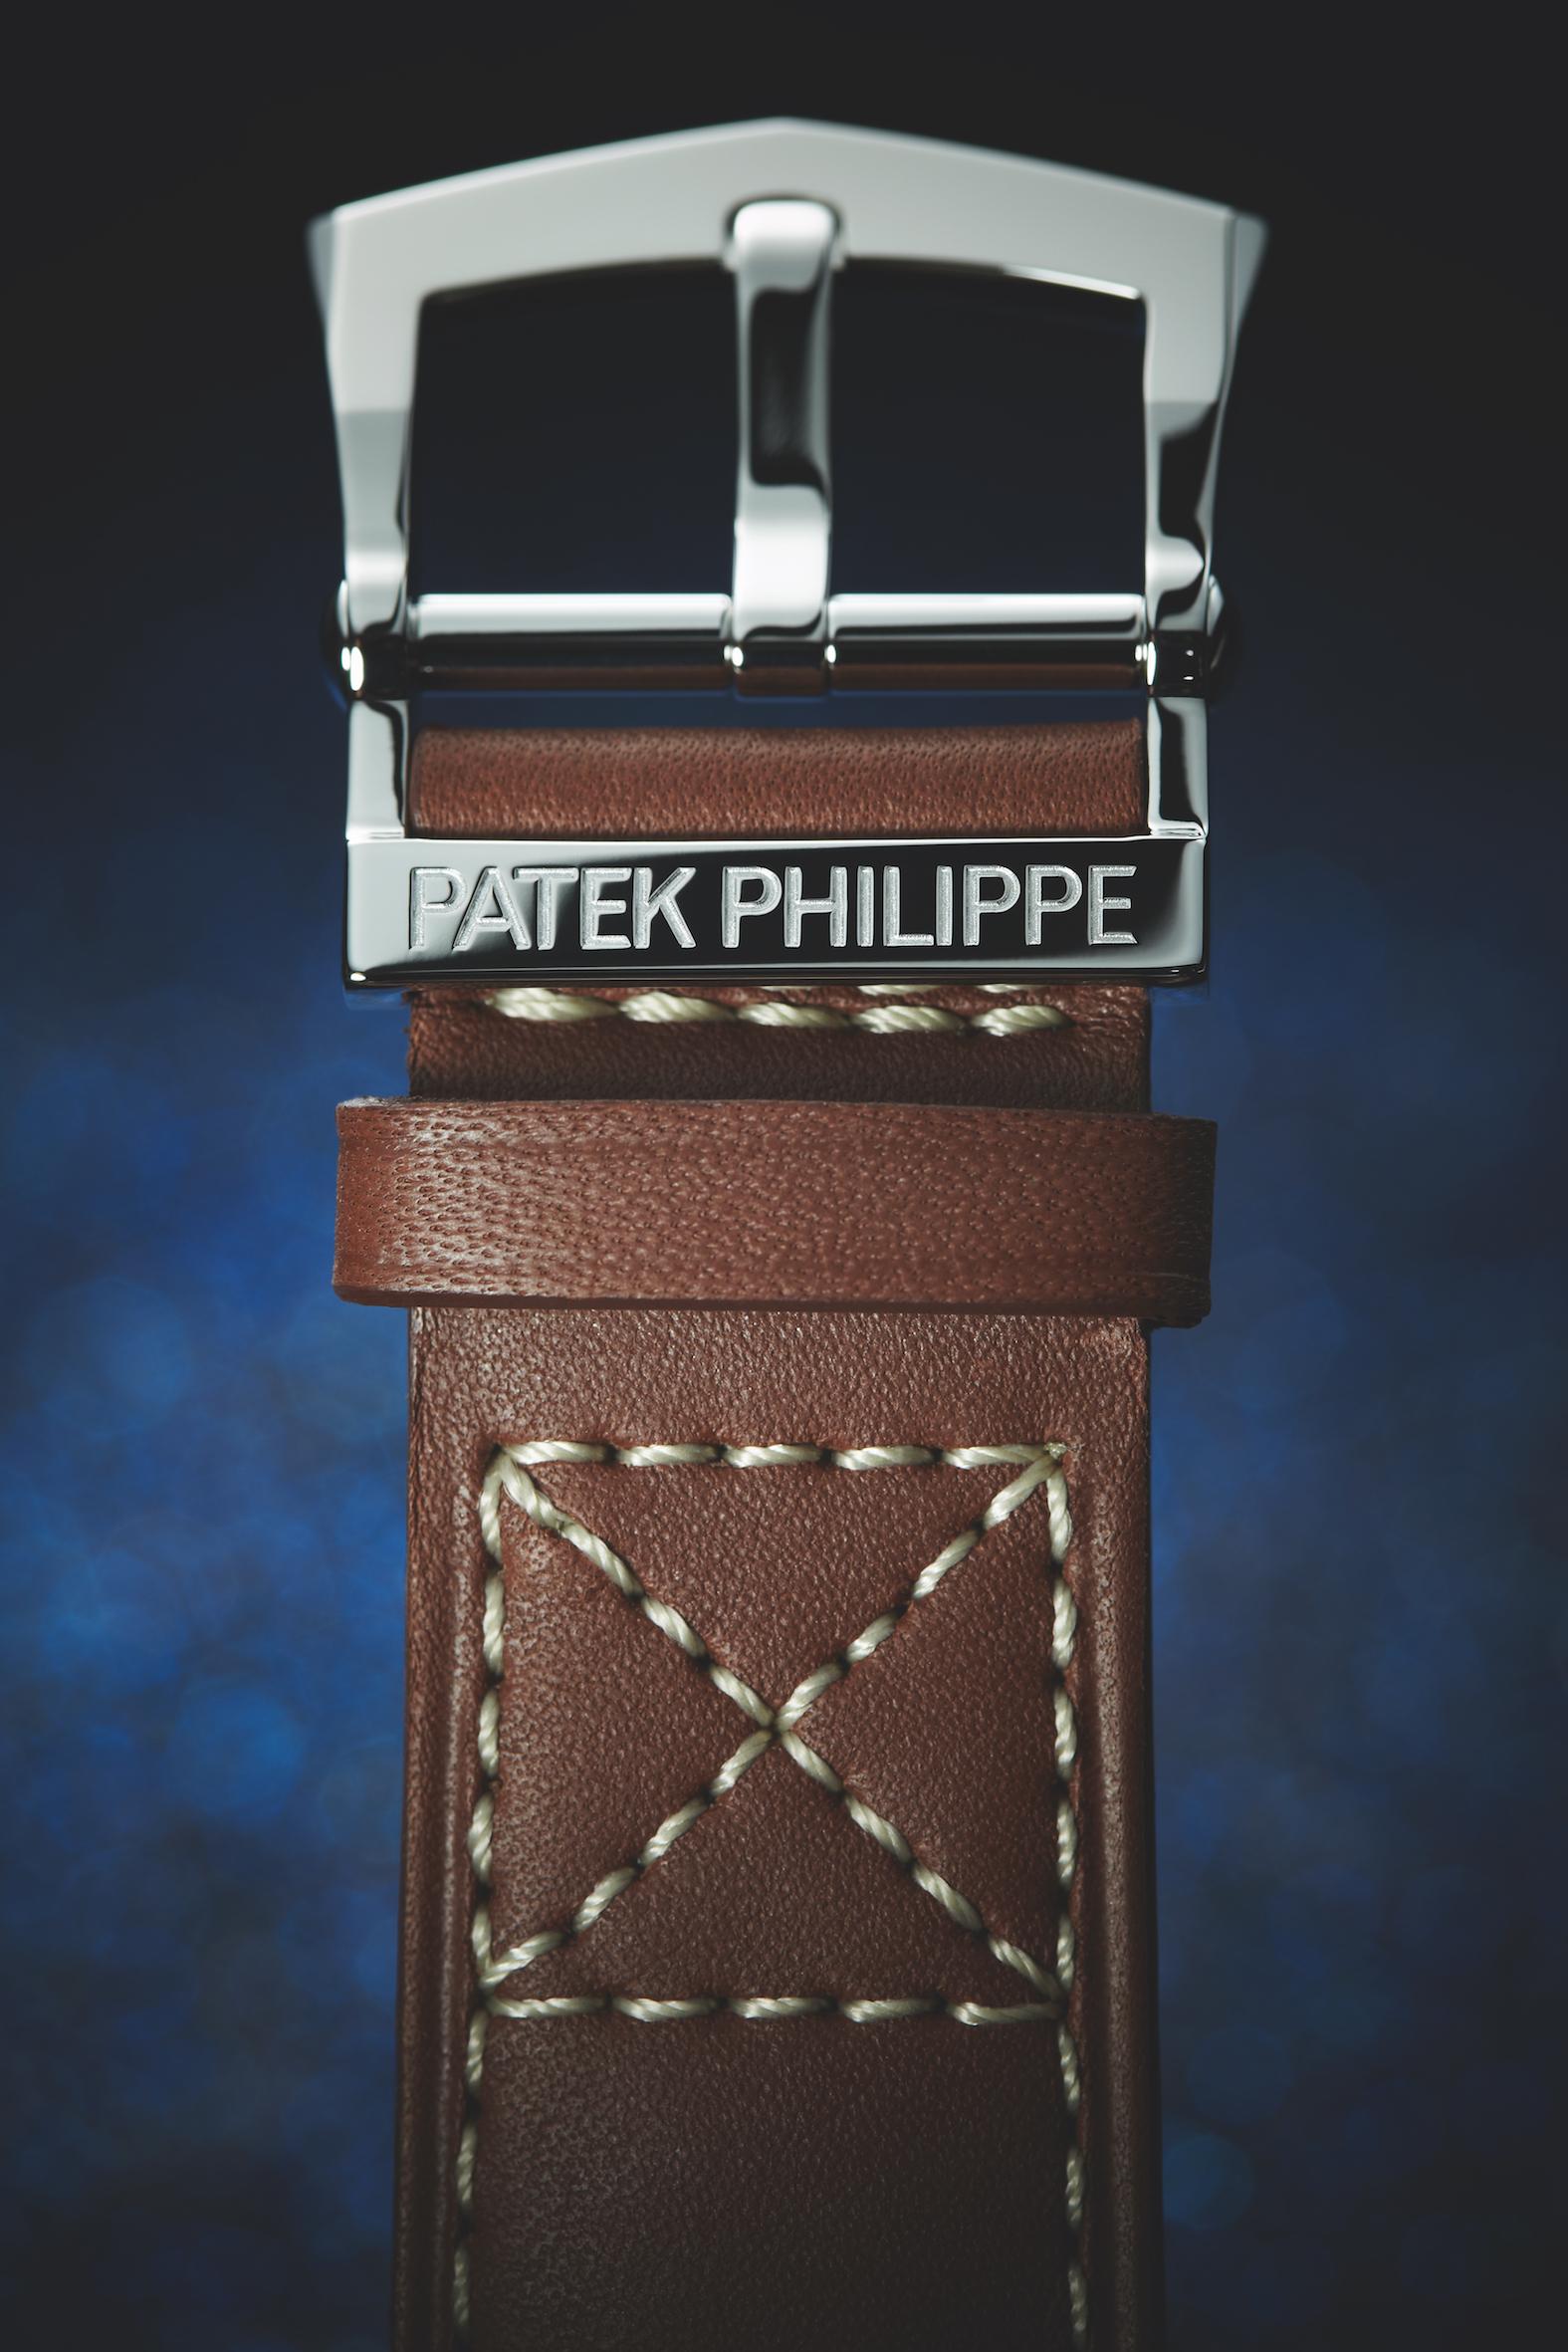 Patek Philippe Men's Calatrava Pilot wristwatch Ref. 5522 New York 2017 Special Edition